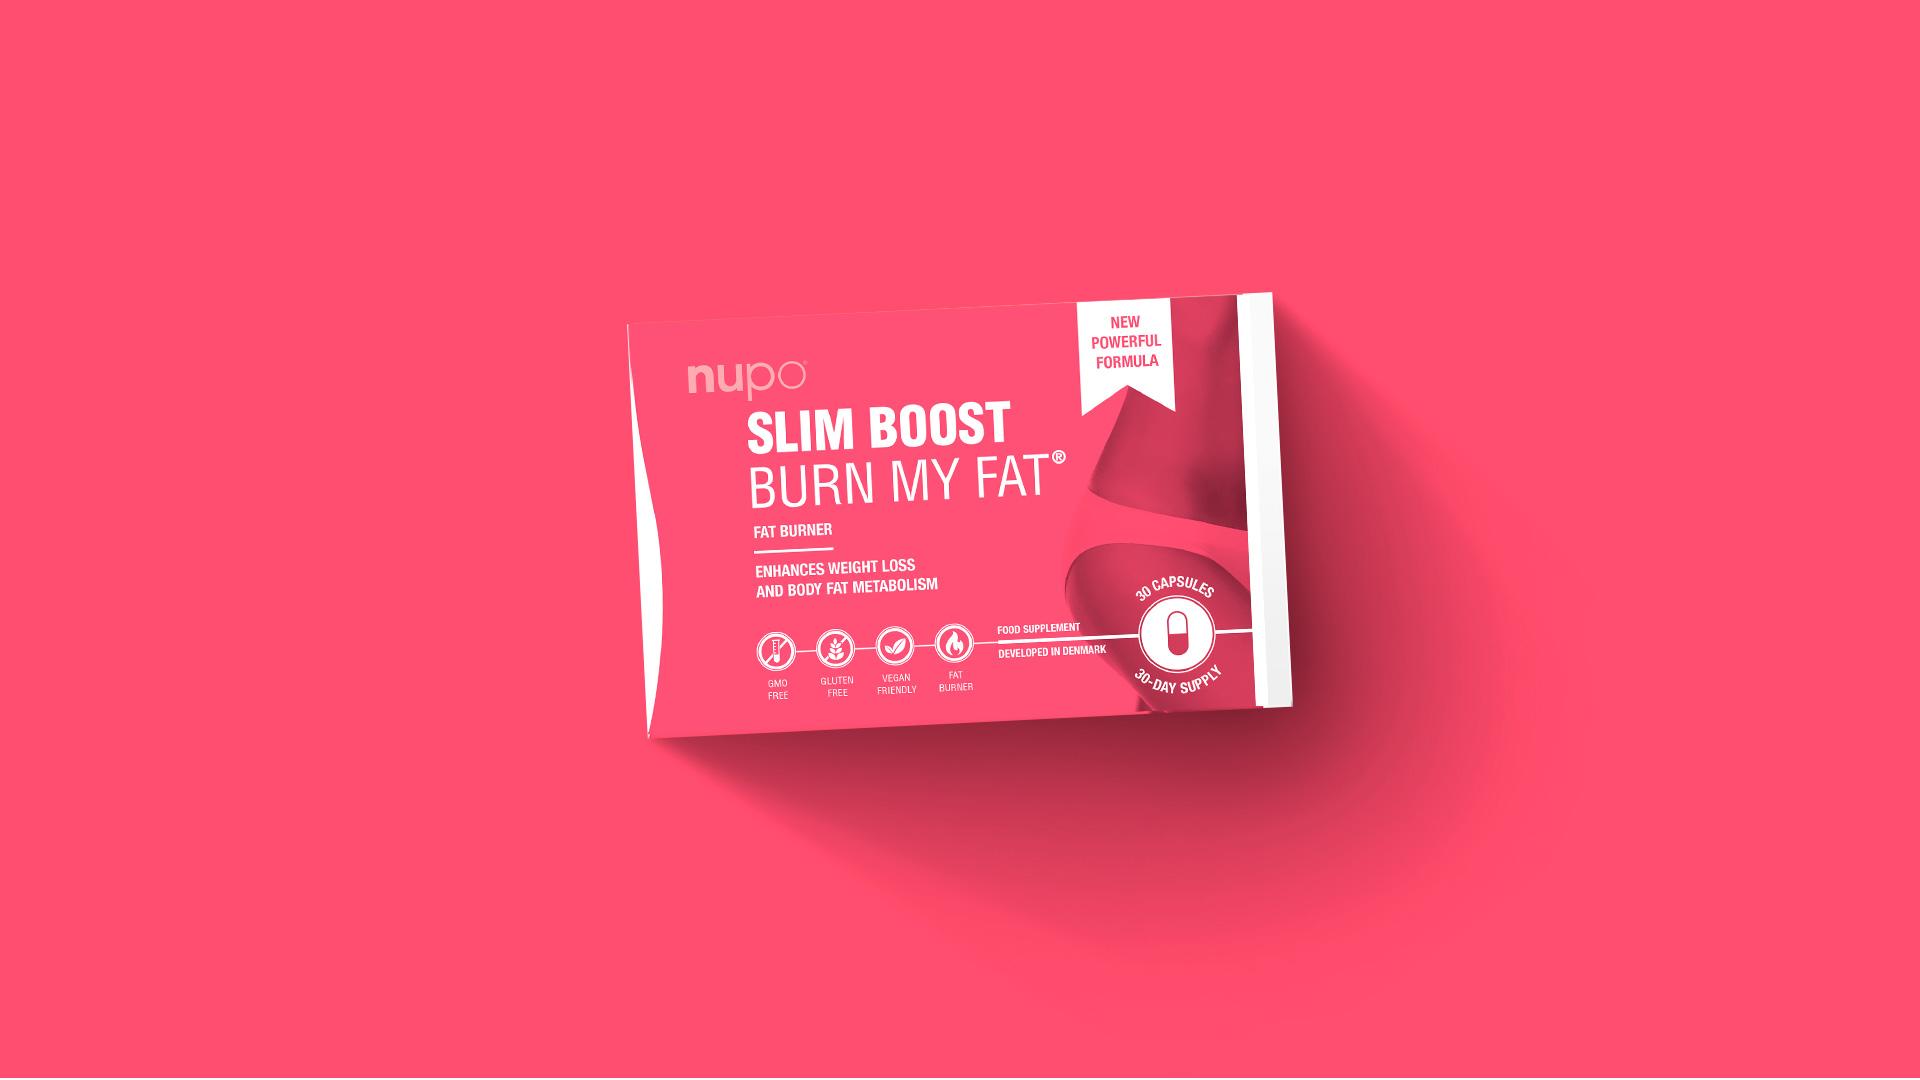 slim-boost-burn-my-fat-product-2